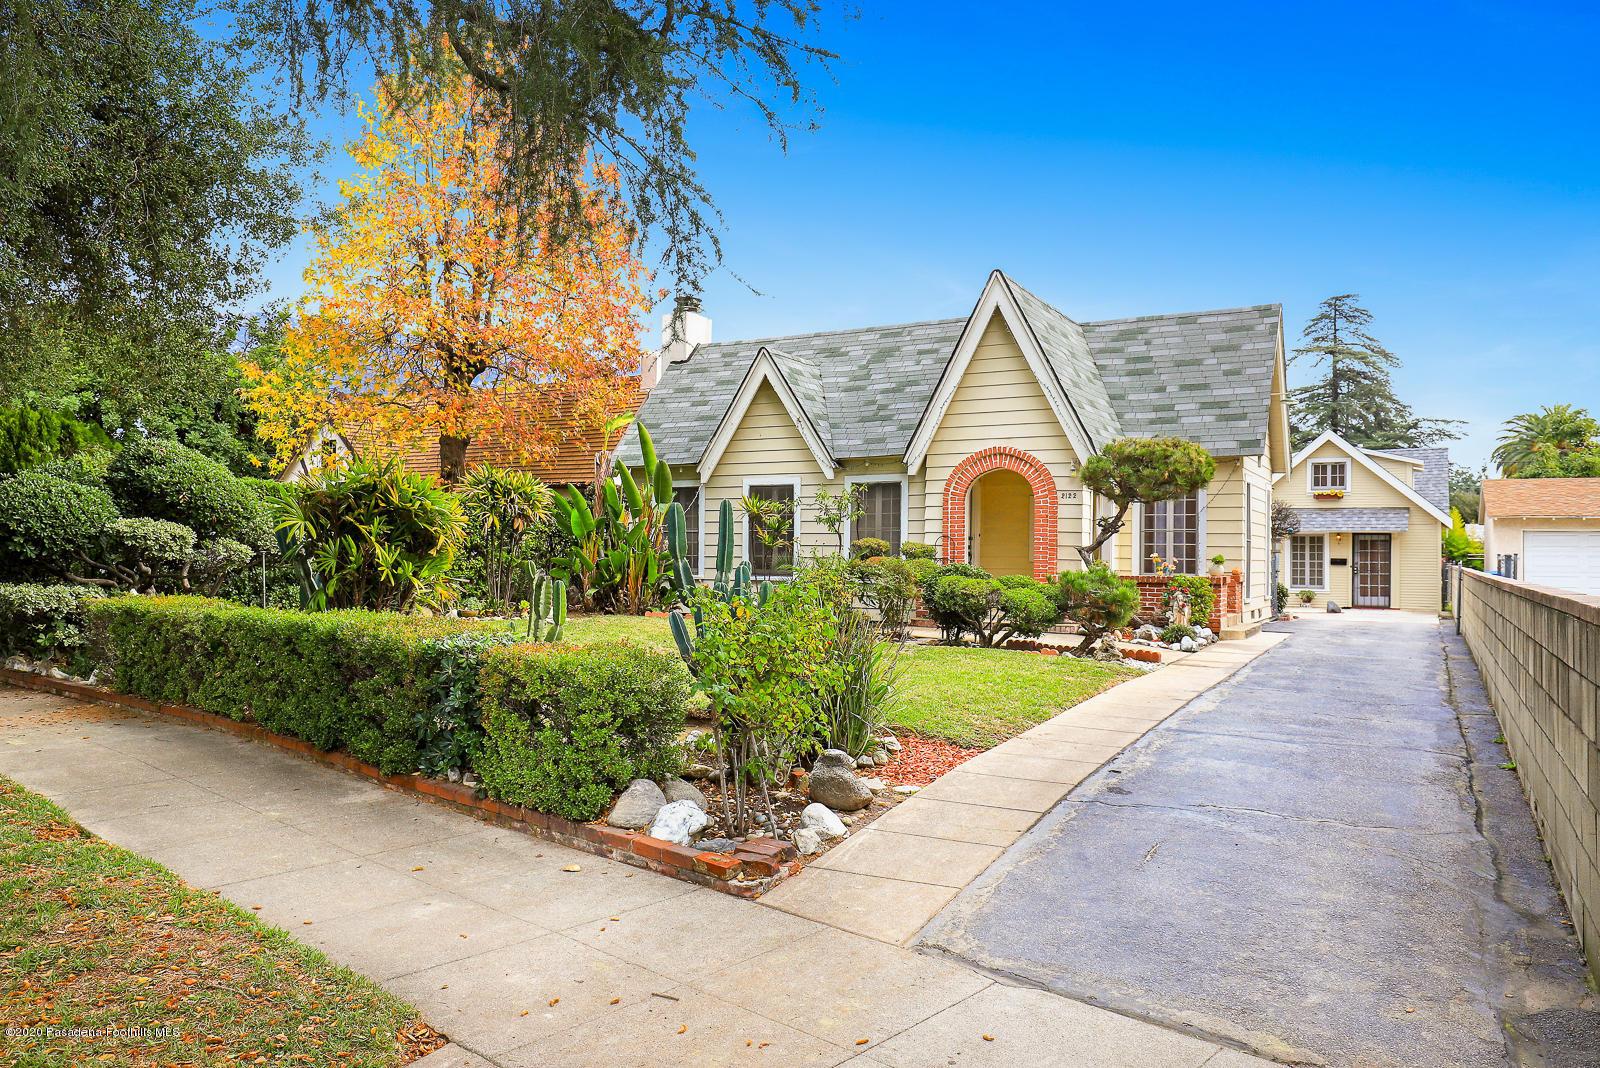 2120 Navarro Avenue, Altadena, California 5 Bedroom as one of Homes & Land Real Estate